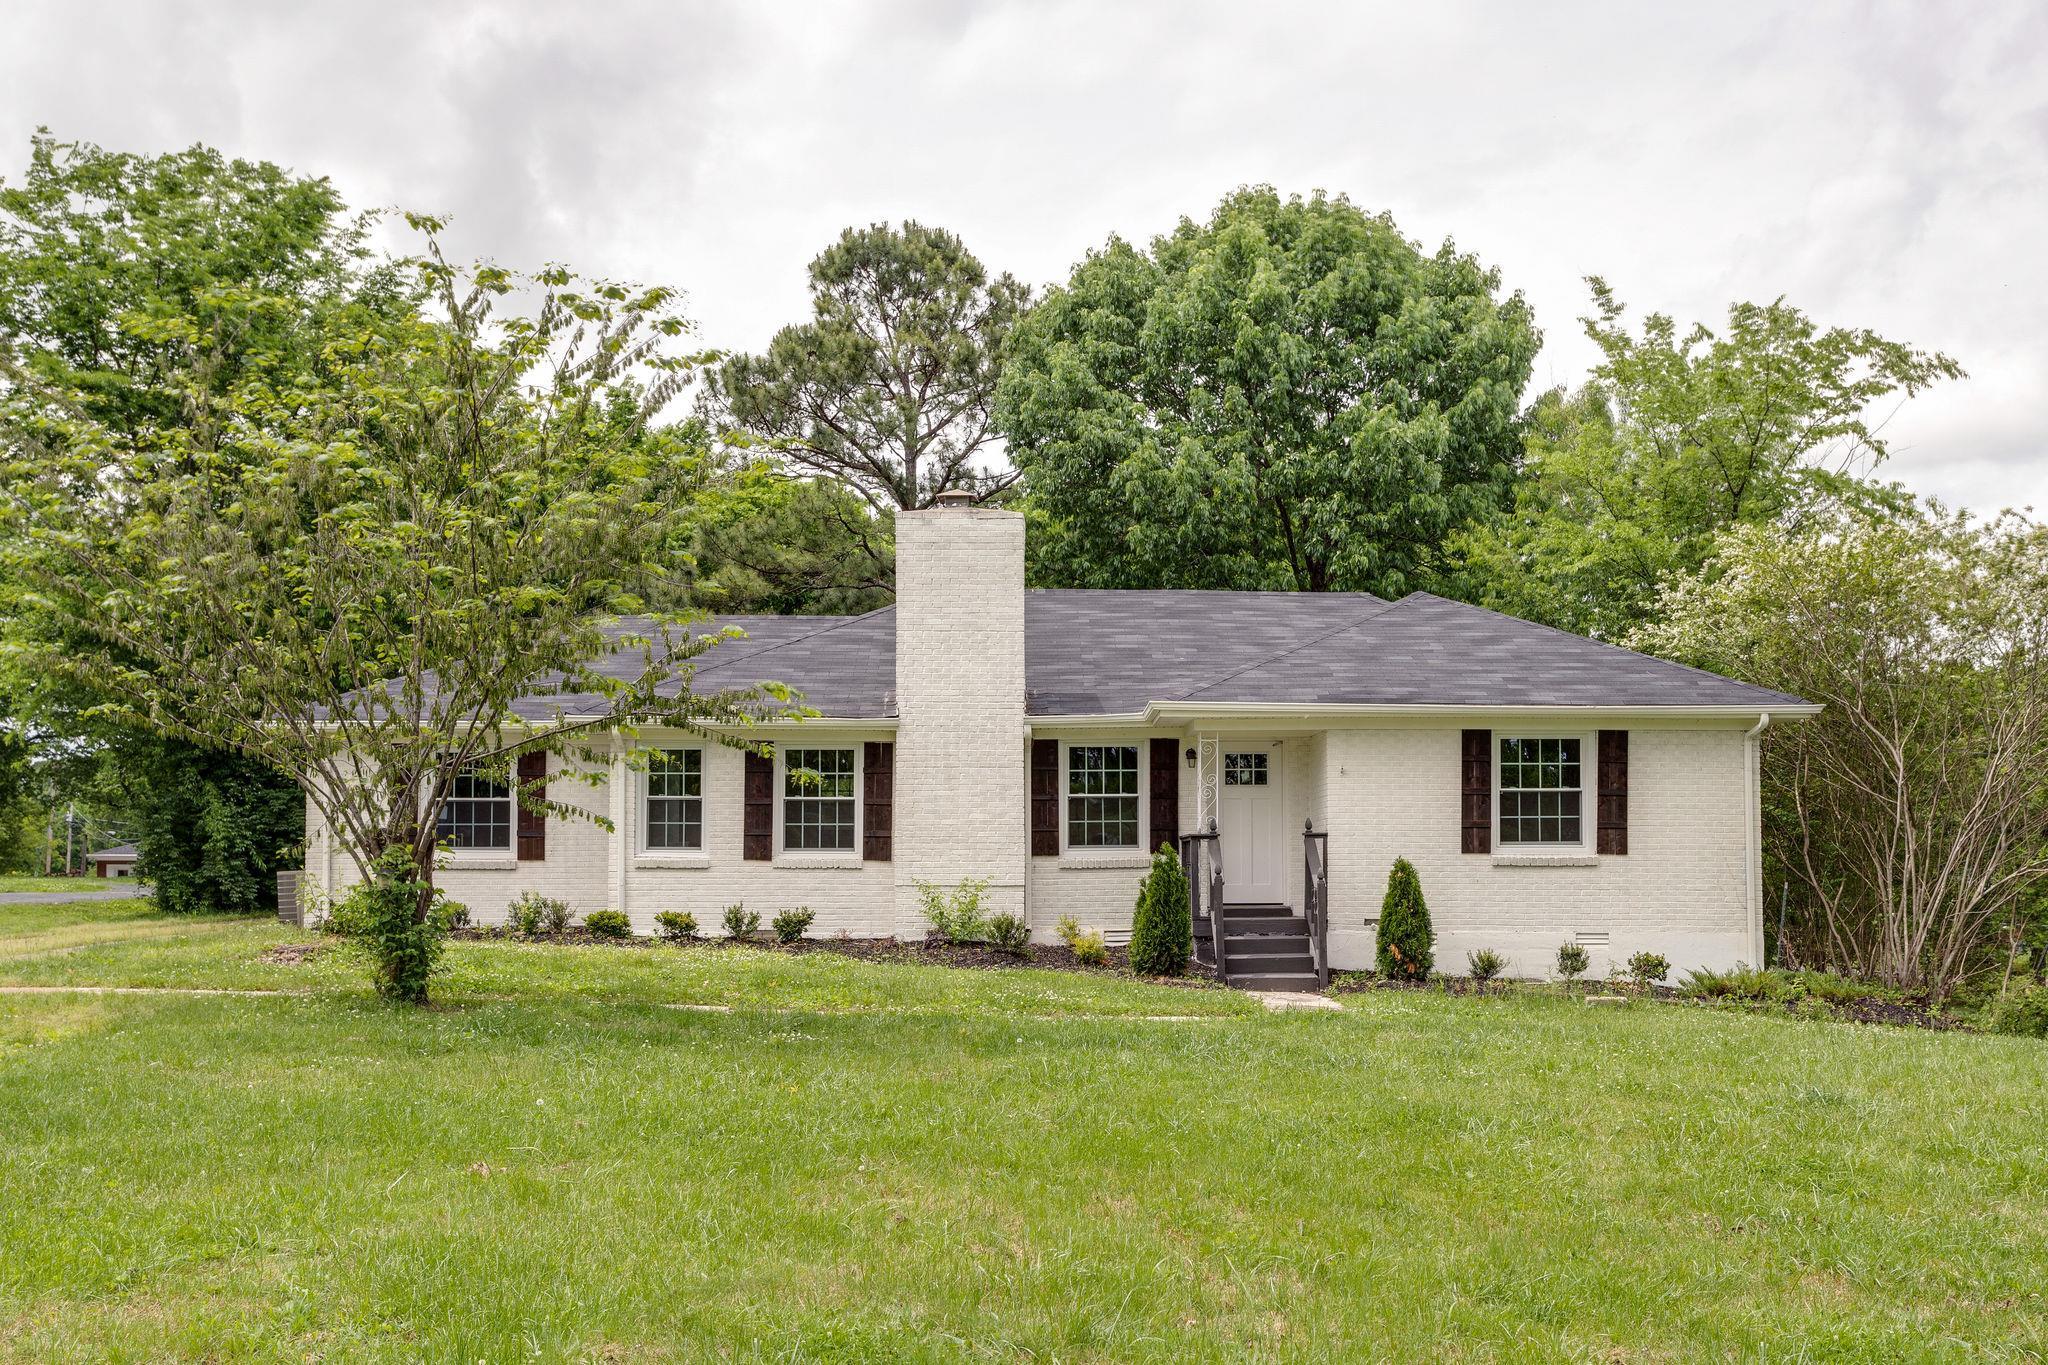 730 Midway St, Lewisburg, TN 37091 - Lewisburg, TN real estate listing